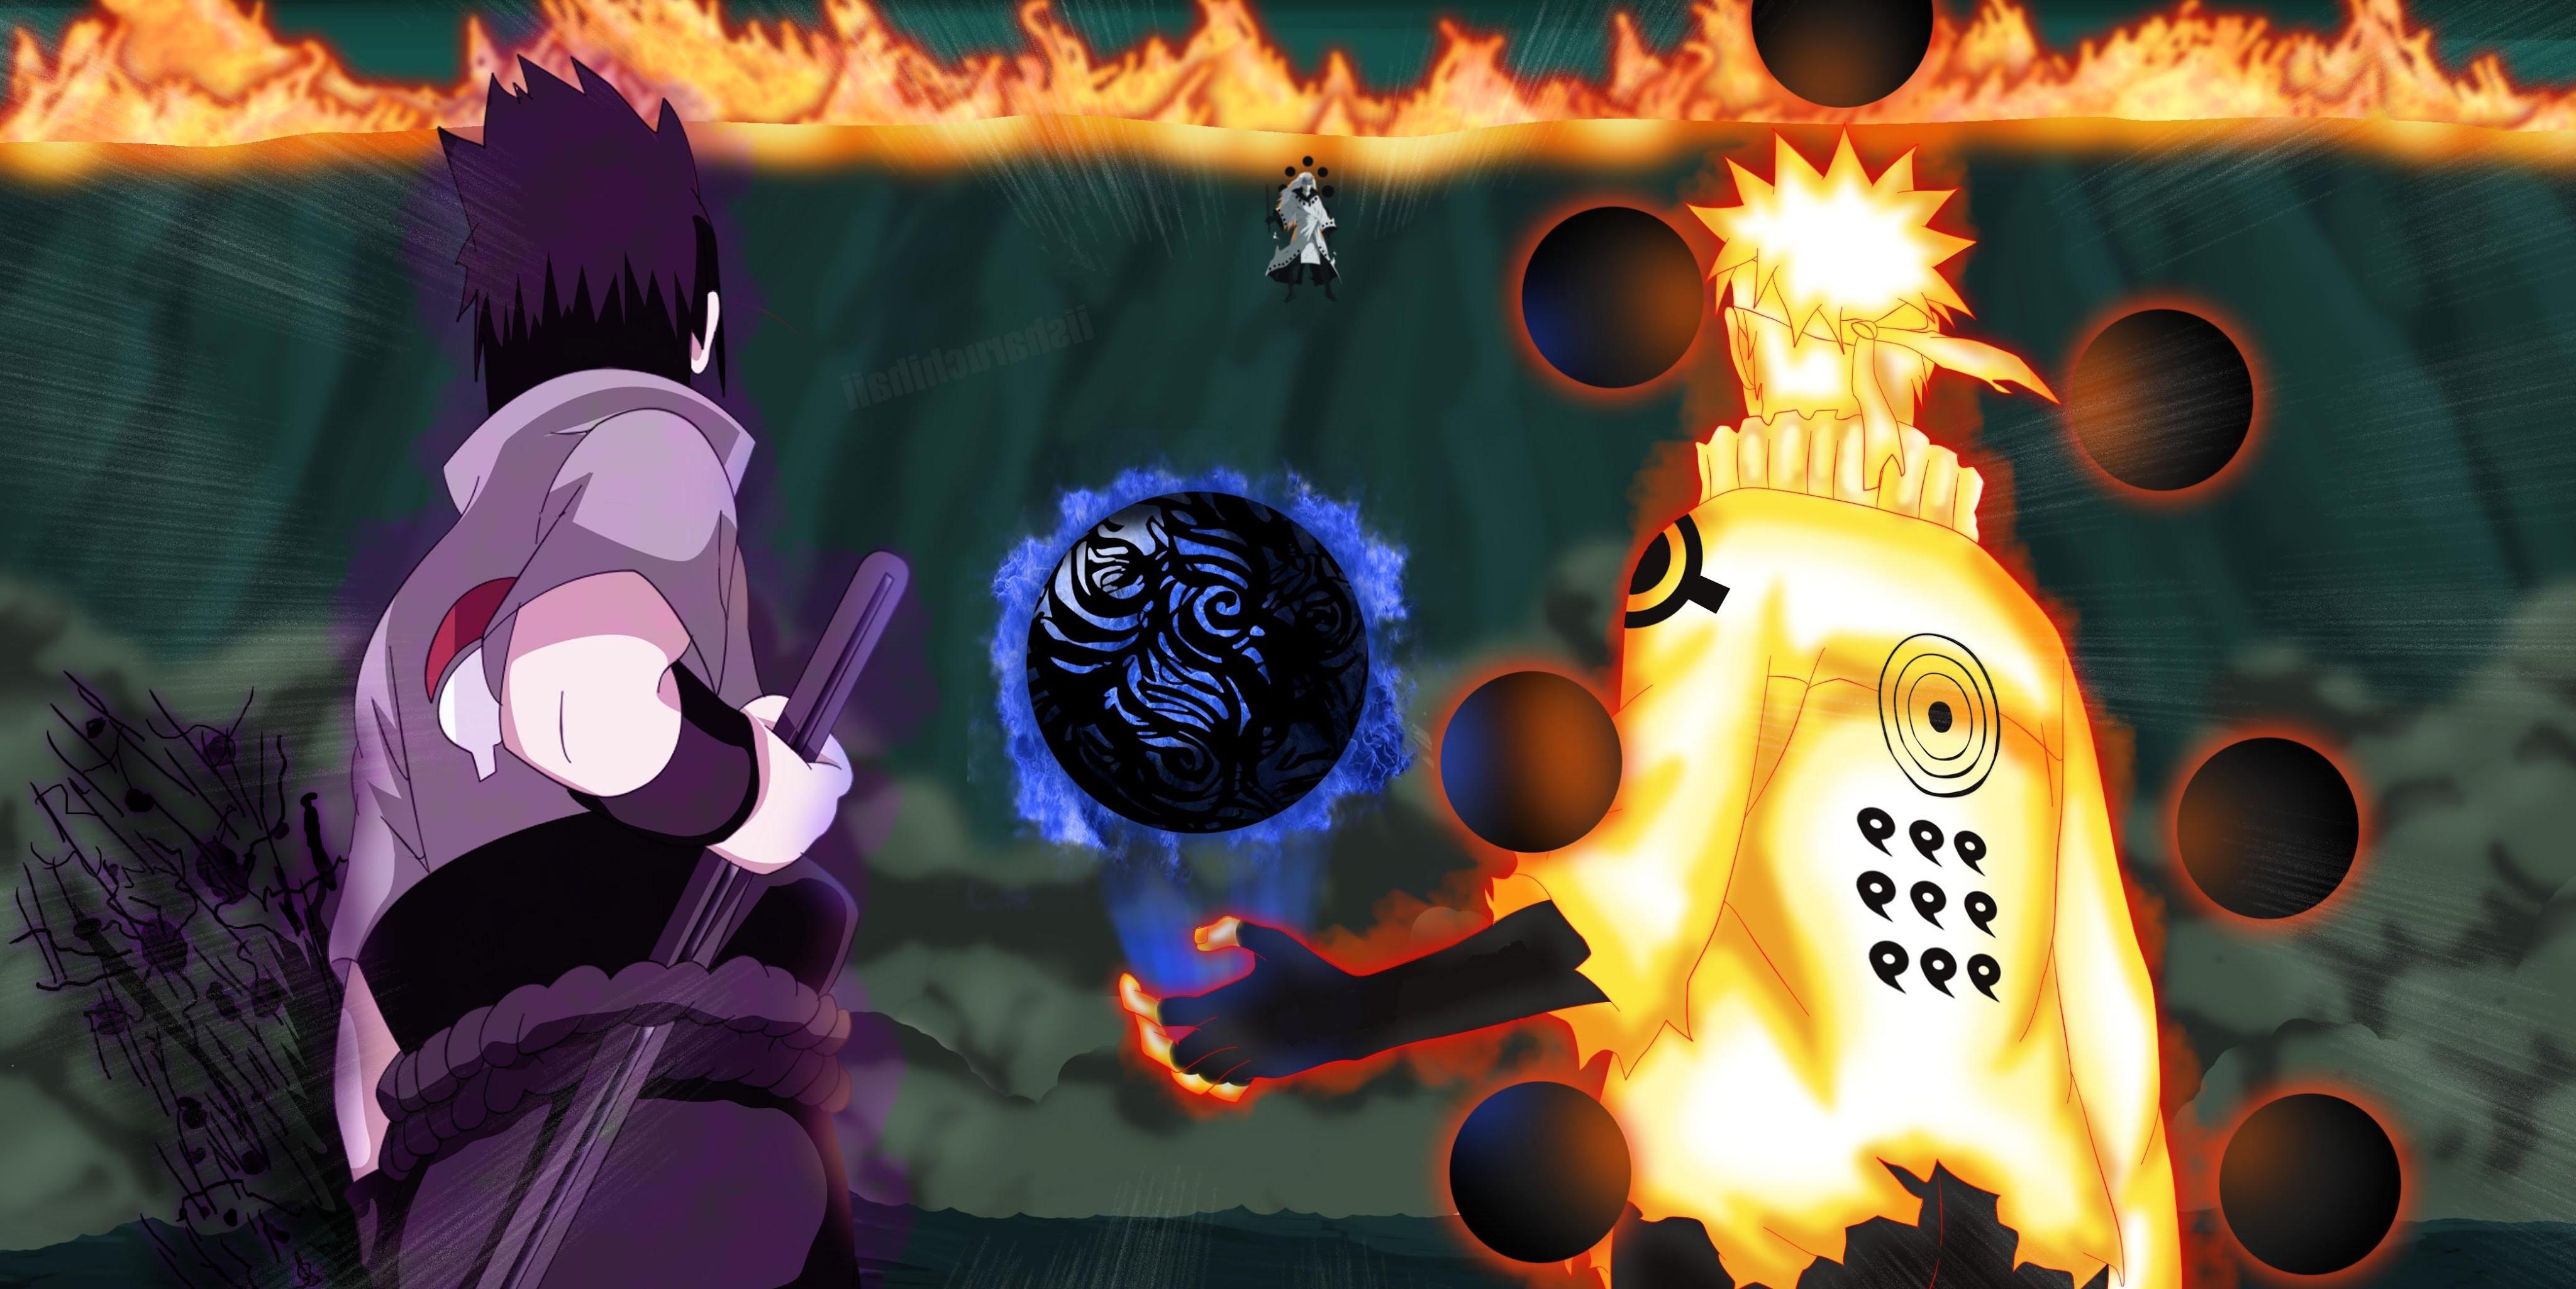 Six Path Sage Mode Robin Super Smash Bros Wii U Works In